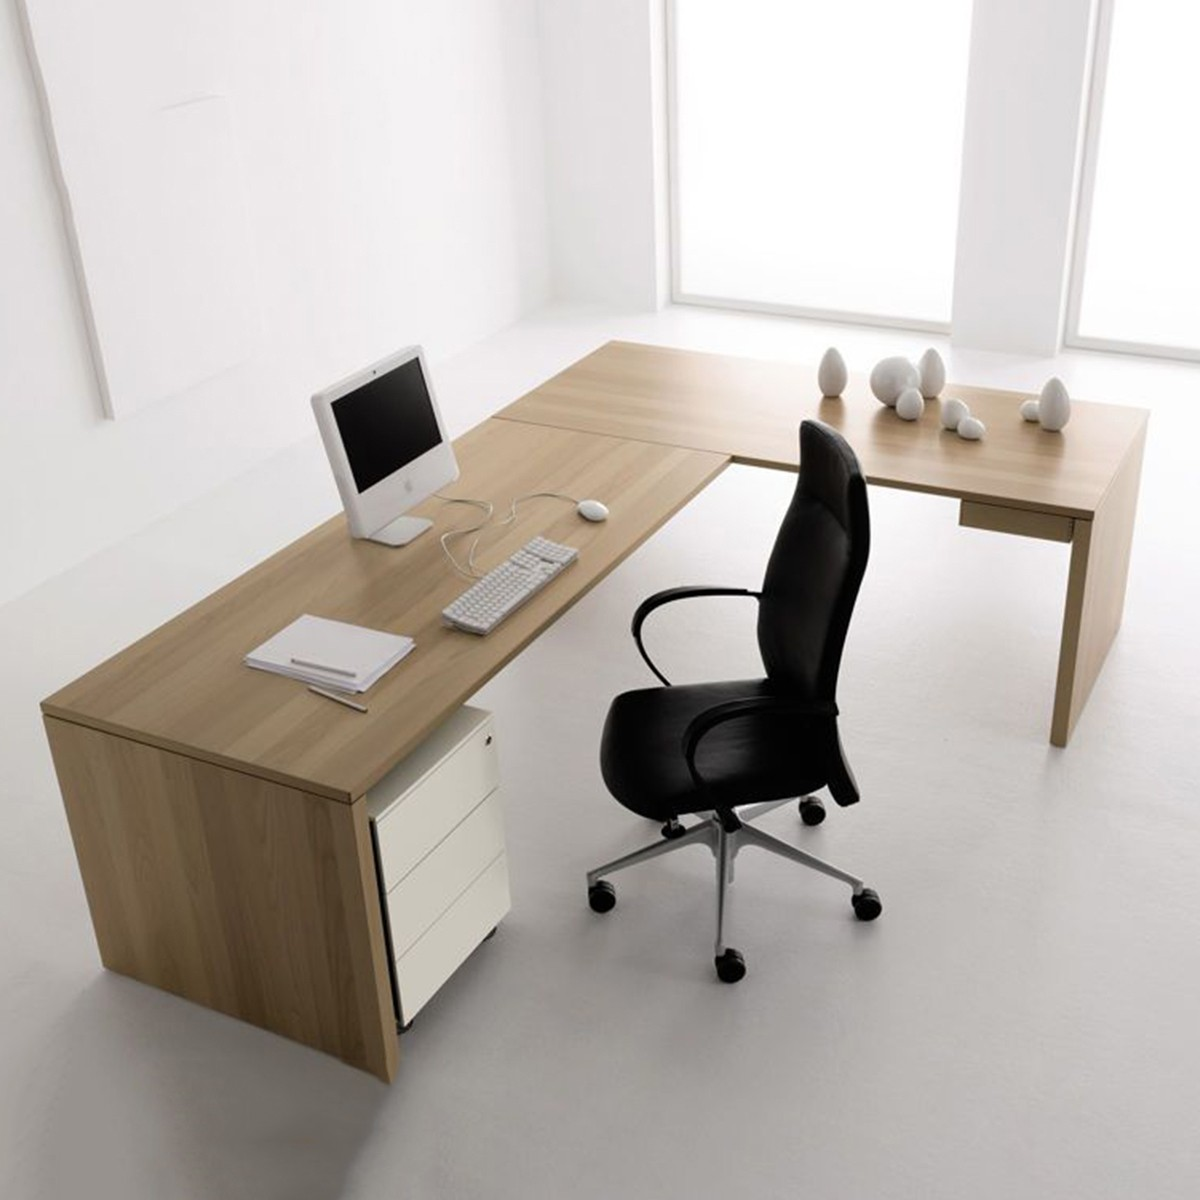 Modern l shaped desks 1 & Modern L Shaped Desks - Foter